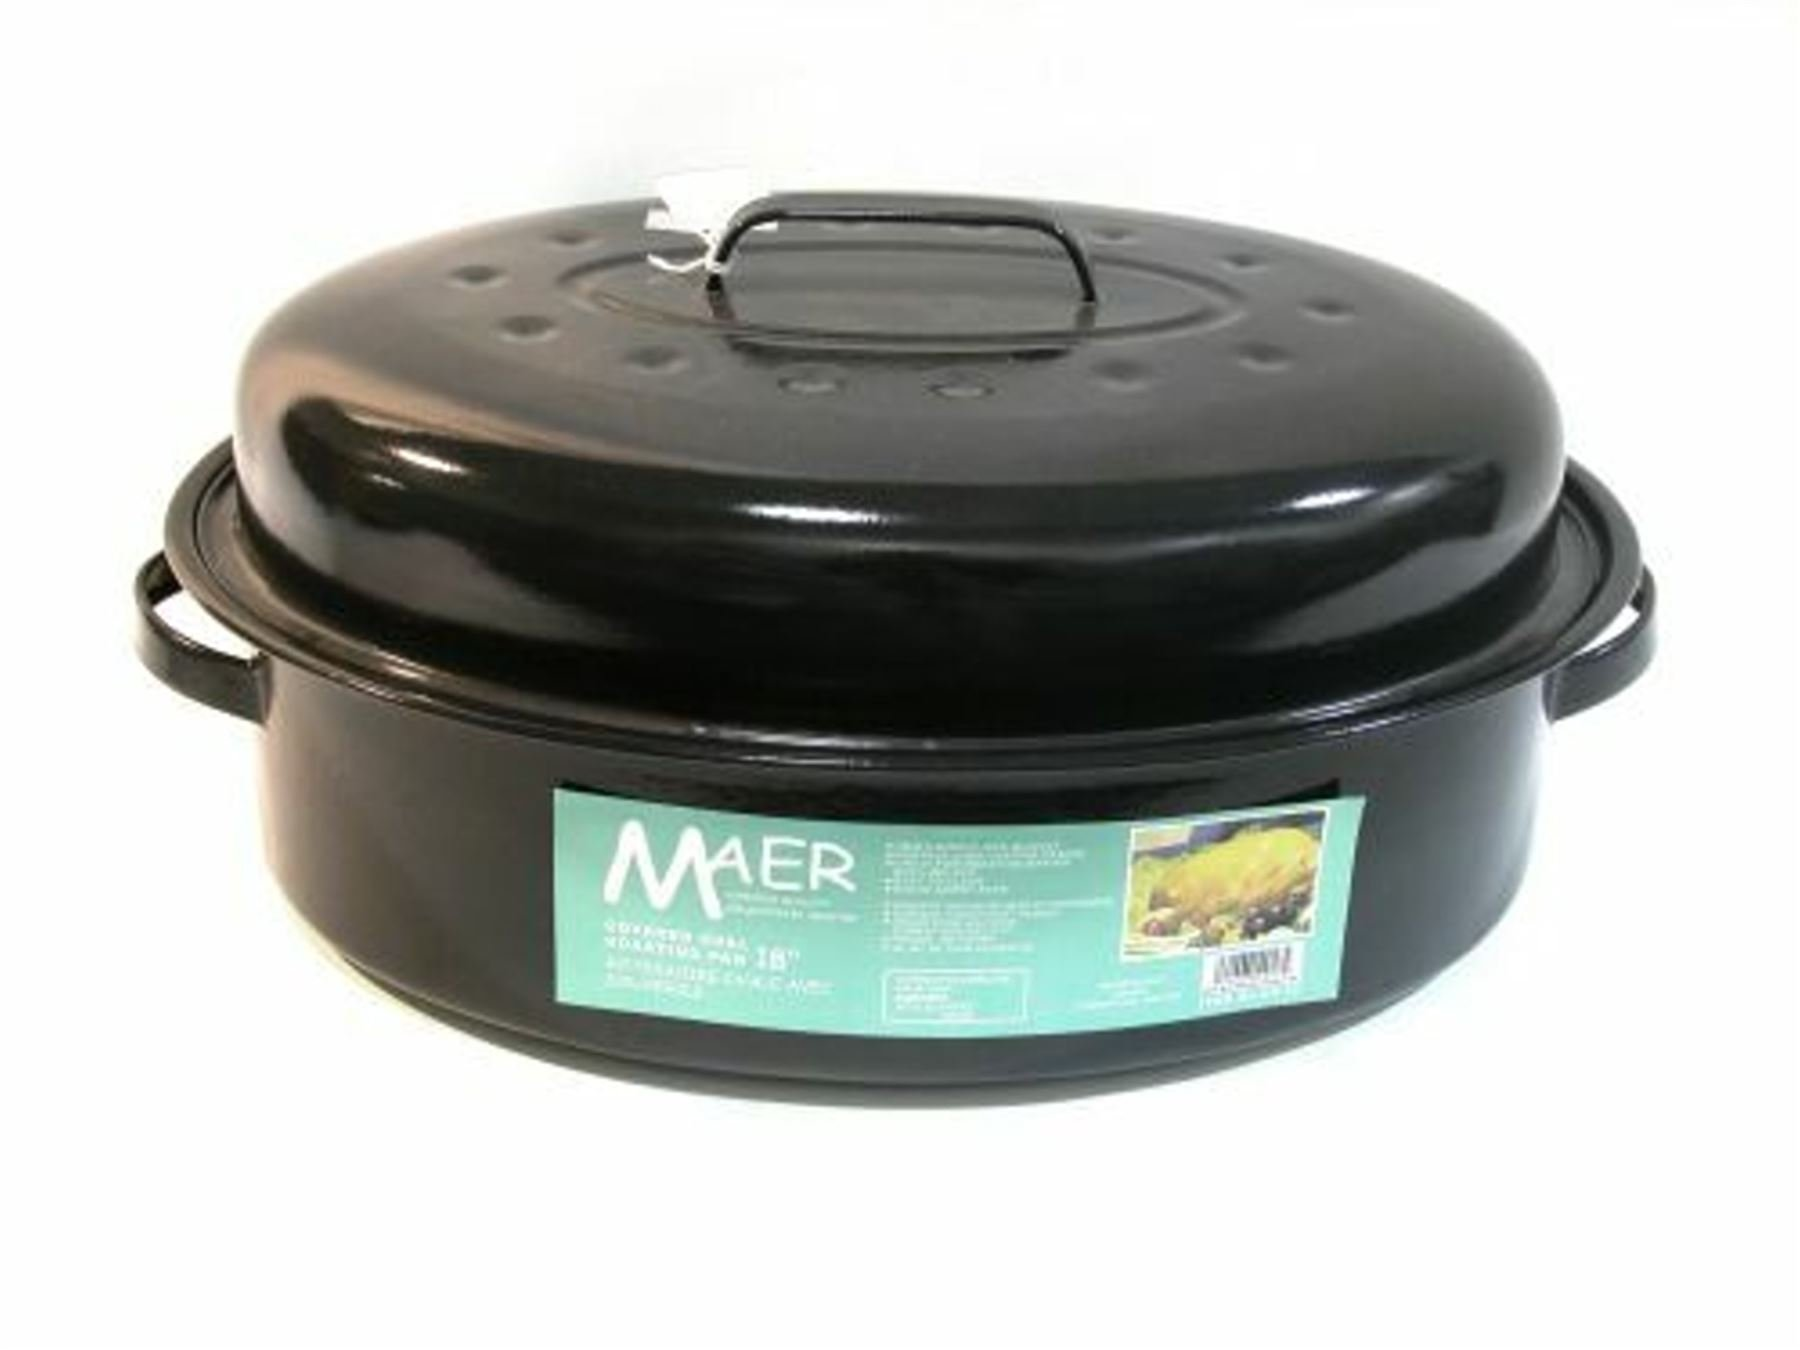 Maer Enamel 18-inch Oval Roaster With Lid